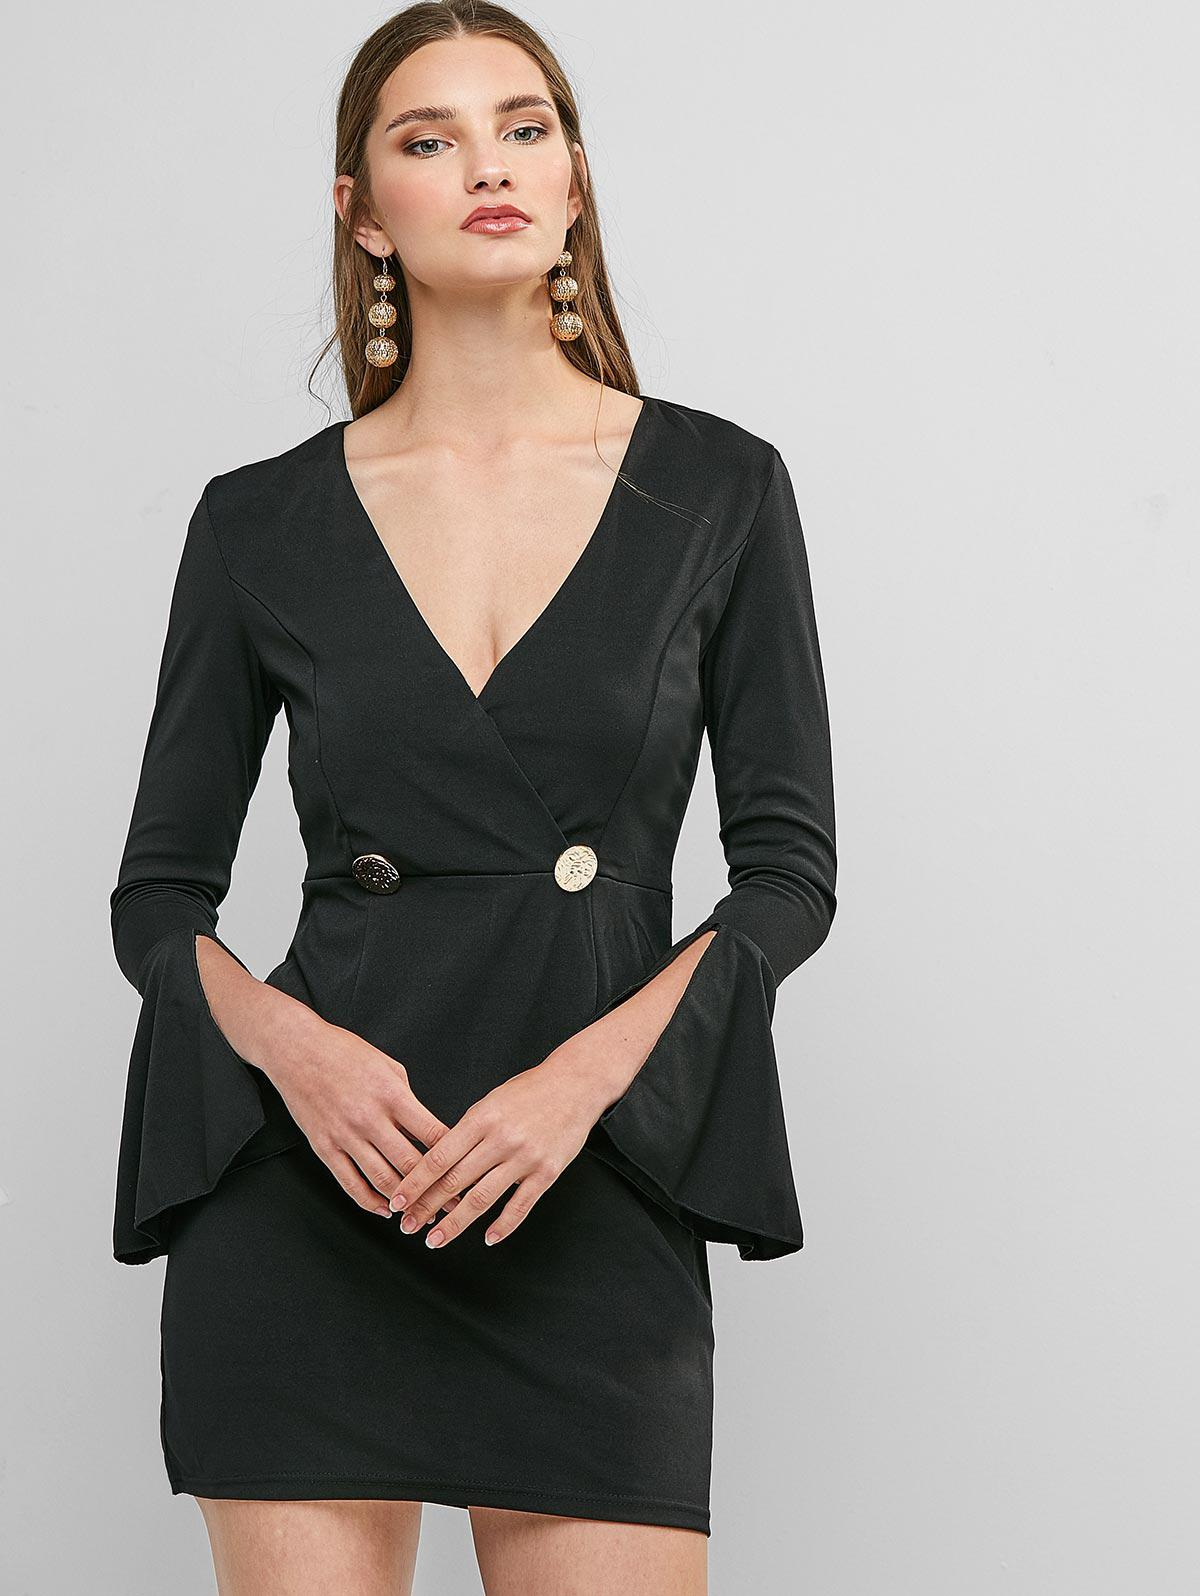 Flare Sleeve Mock Buttons Mini Surplice Dress фото